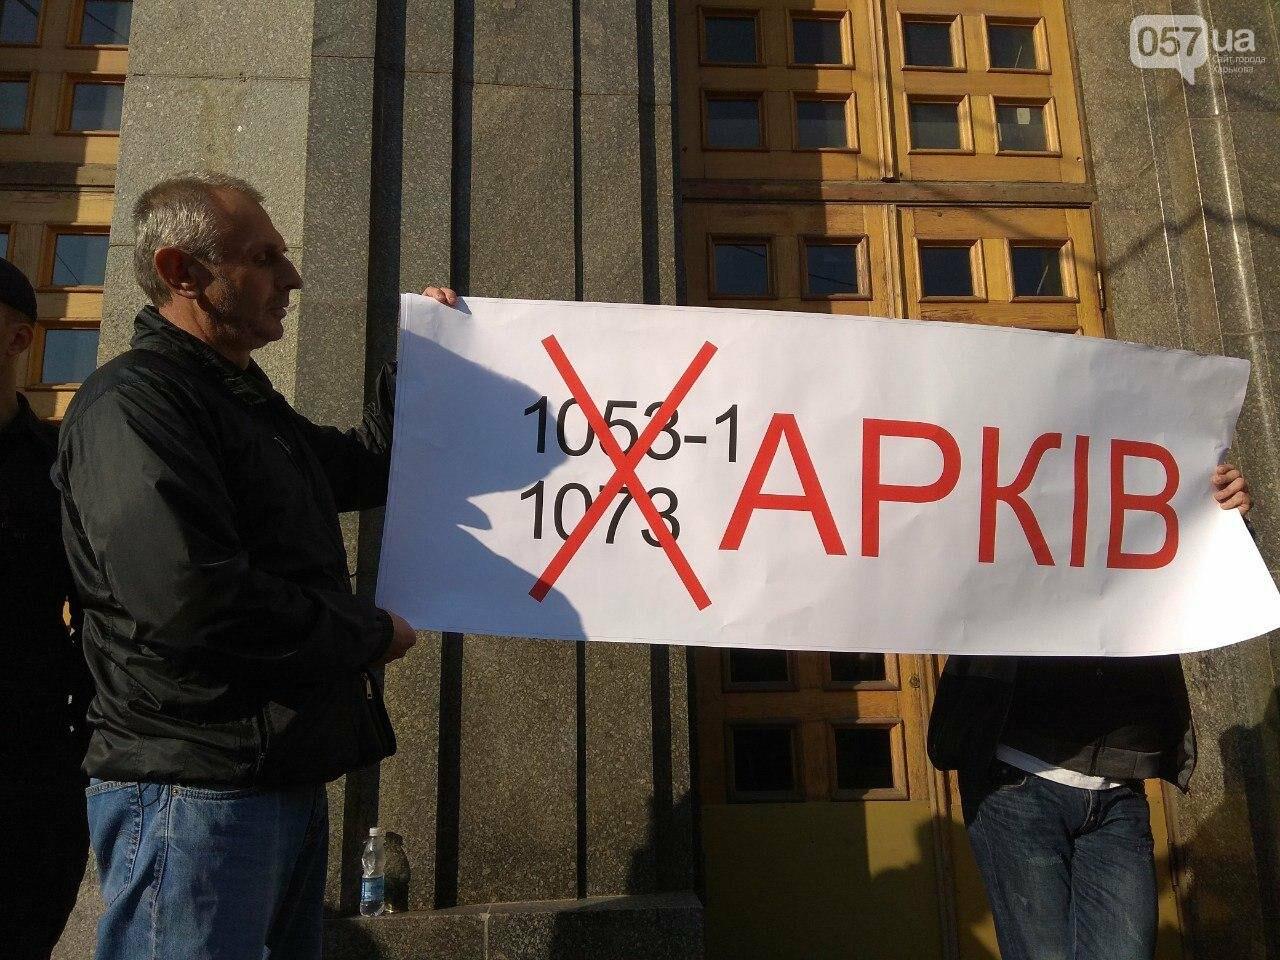 «Нам дорога не нужна»: предприниматели «Барабашово» пикетируют горсовет, - ФОТО, фото-9